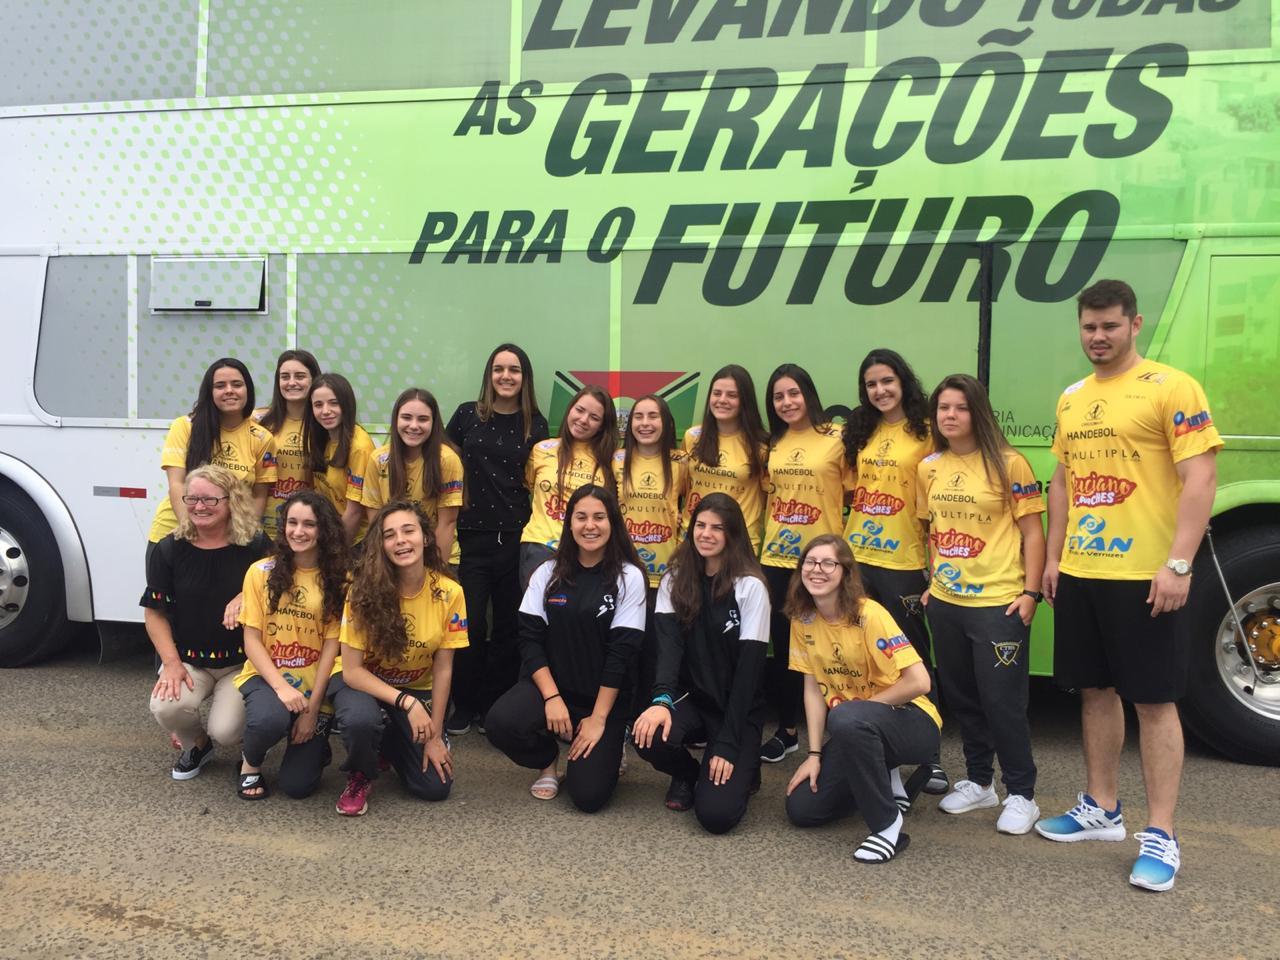 Criciúma sediará Jogos Abertos da Terceira Idade em 2020